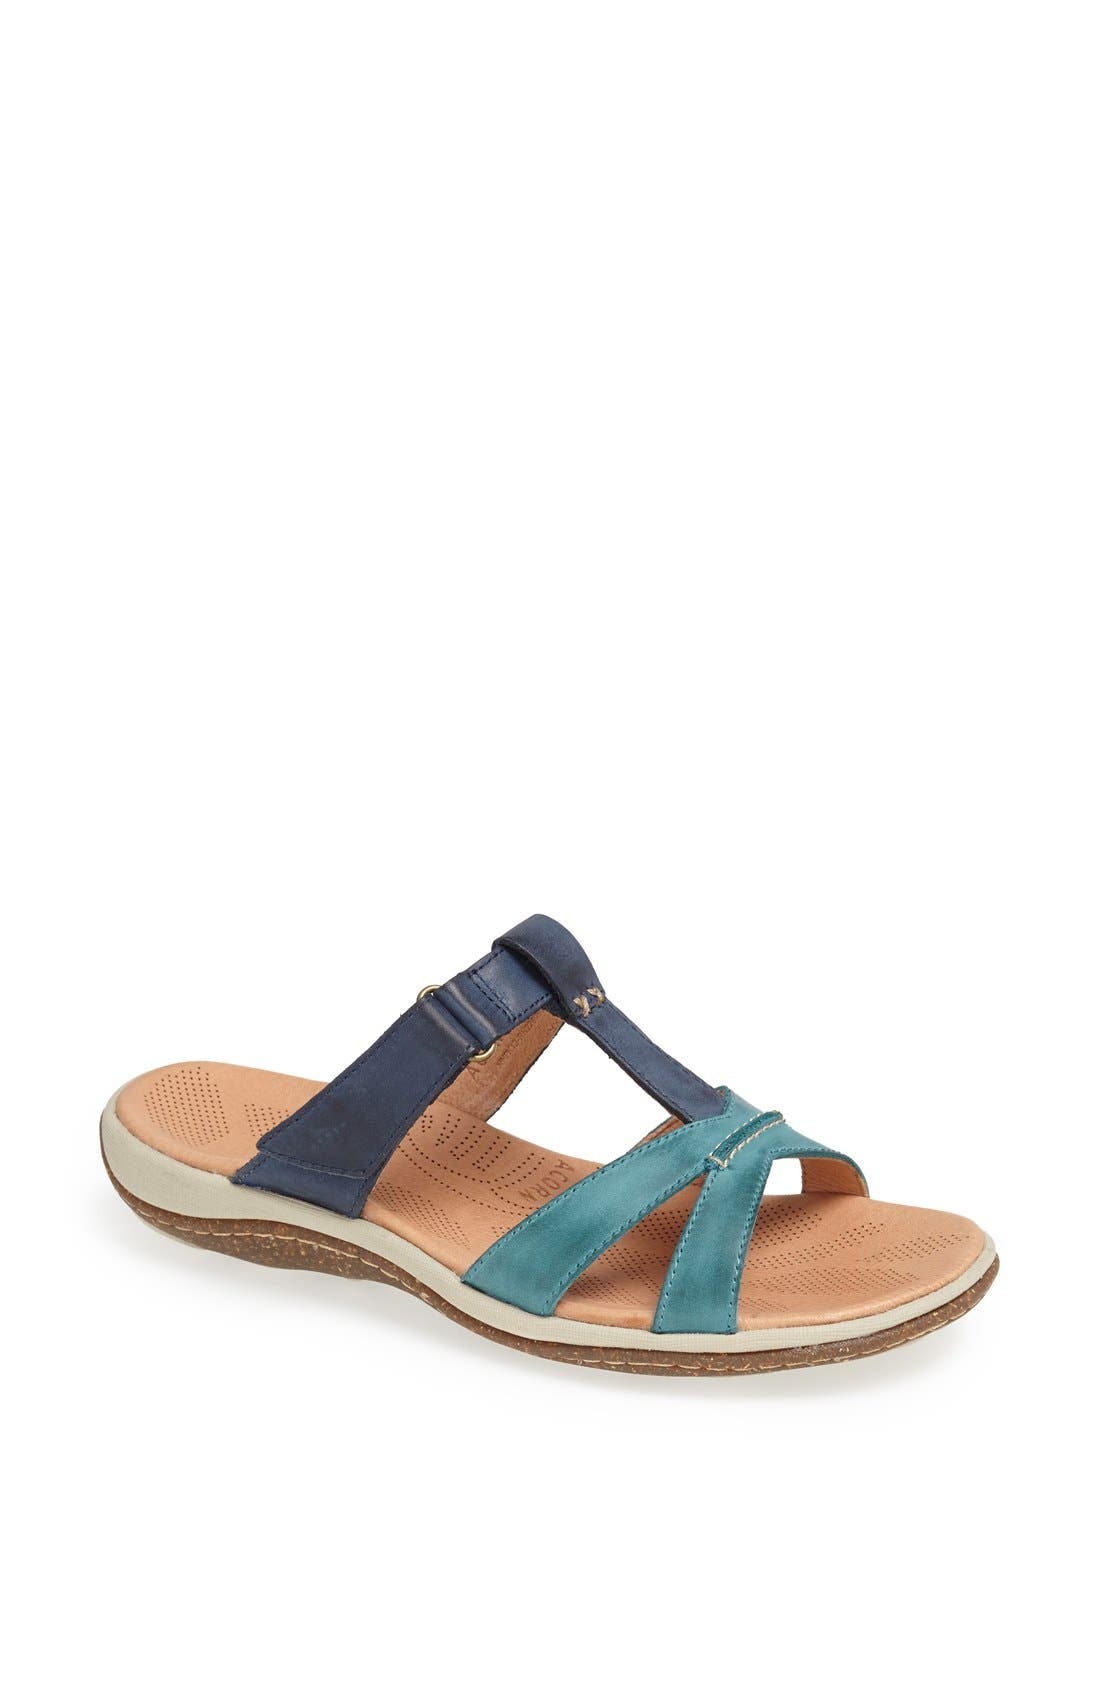 Main Image - Acorn 'C2G Lite' Sandal